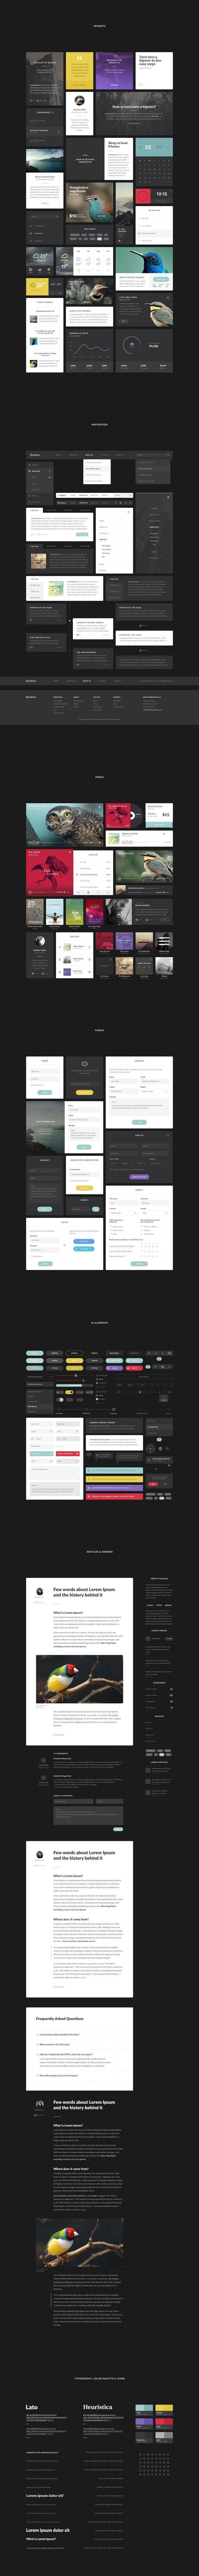 http://designspiration.net/image/5597540675475/